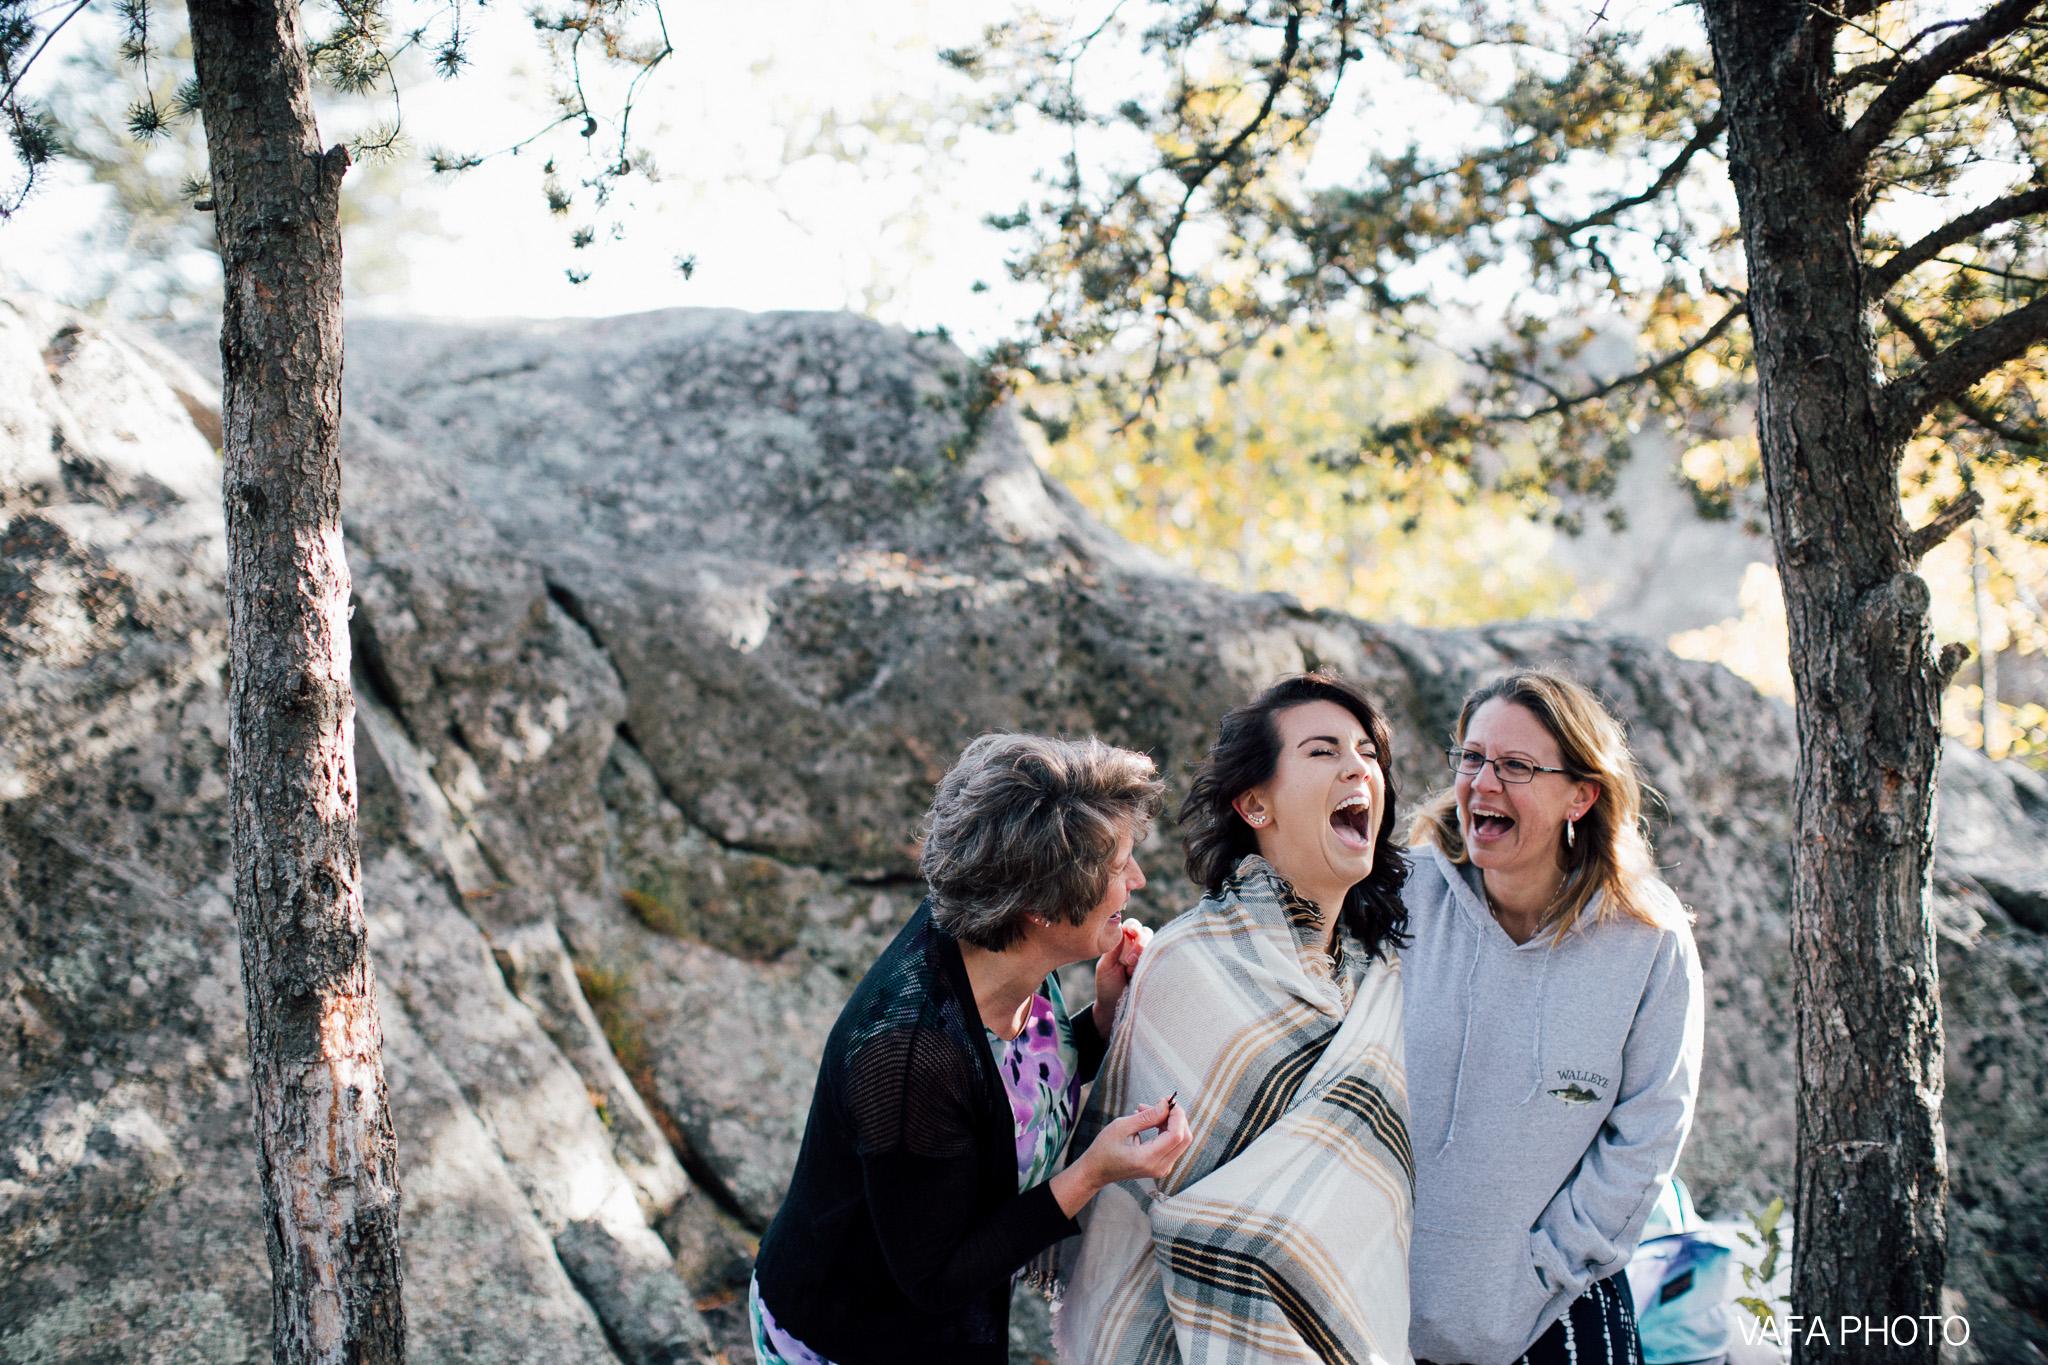 Hogback-Mountain-Wedding-Chelsea-Josh-Vafa-Photo-95.jpg